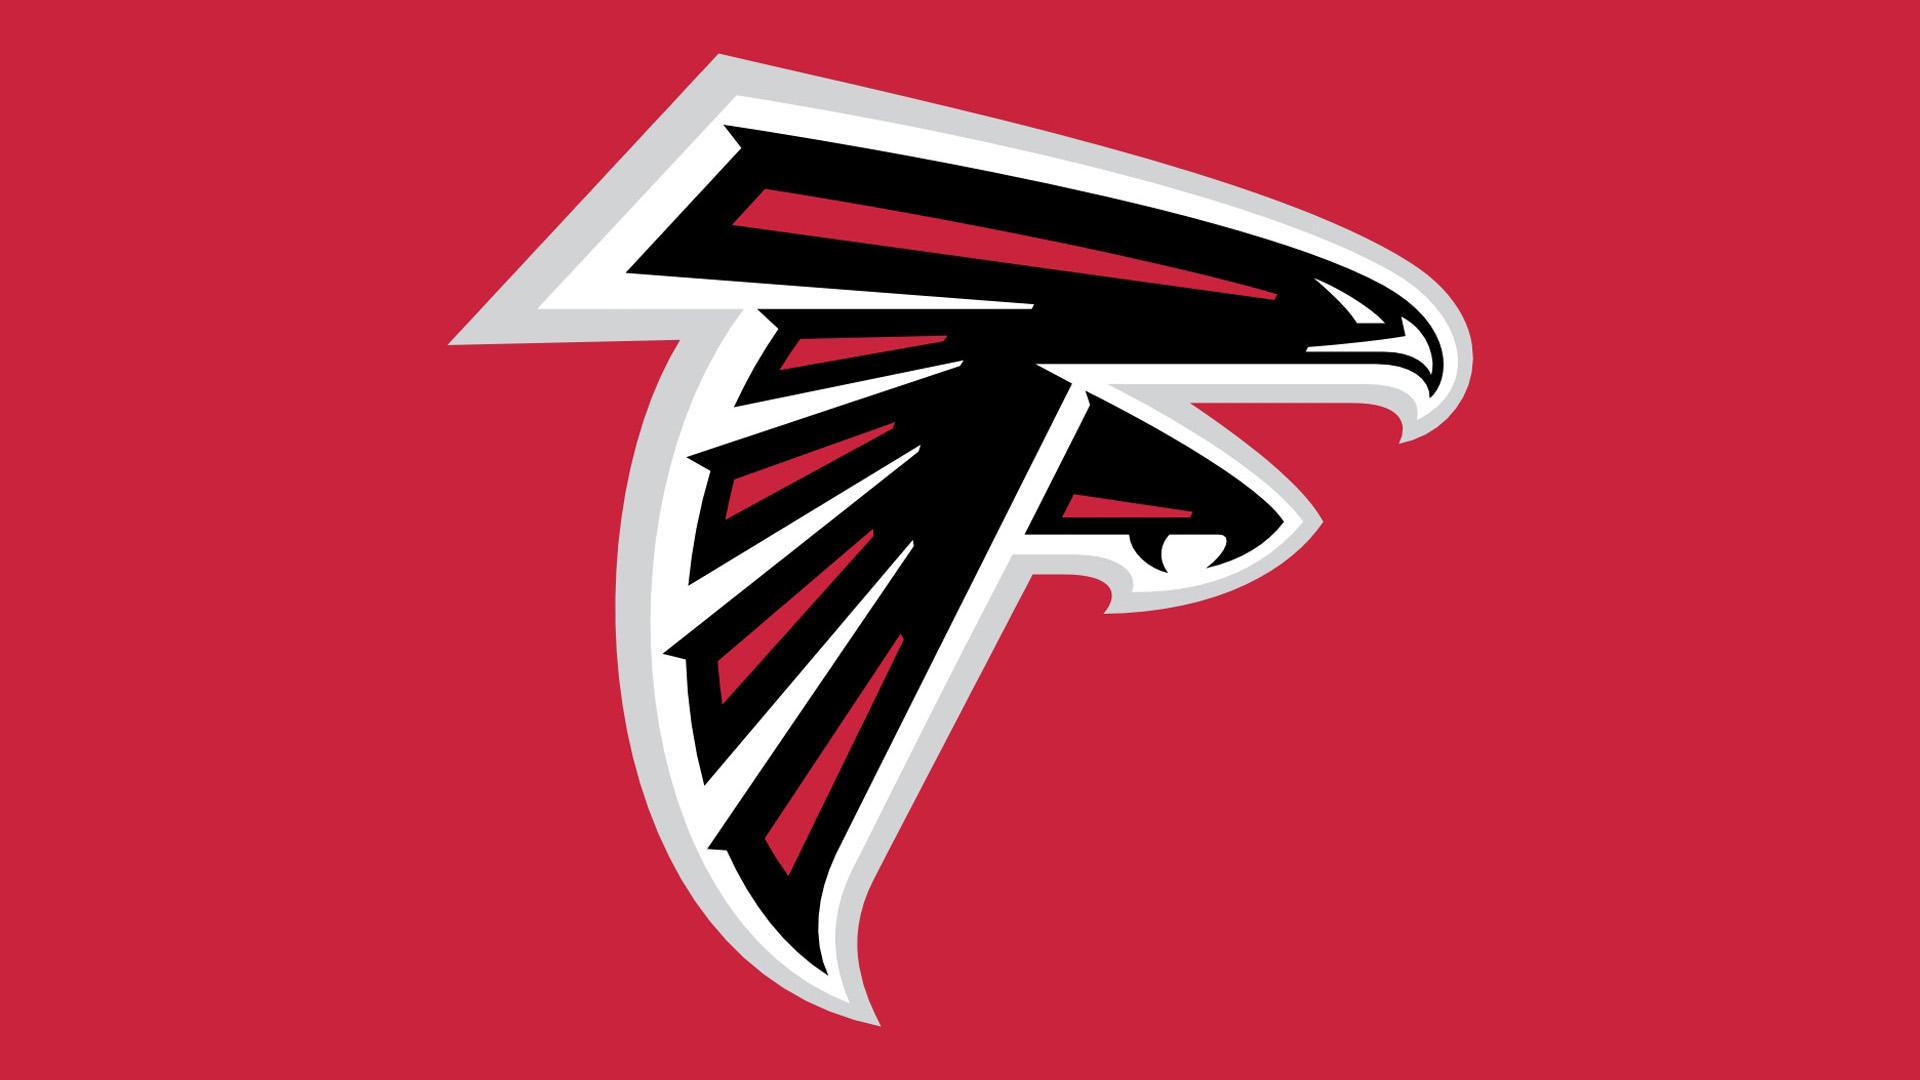 Atlanta Falcons Wallpaper Engine: Printable Atlanta Falcons Logos